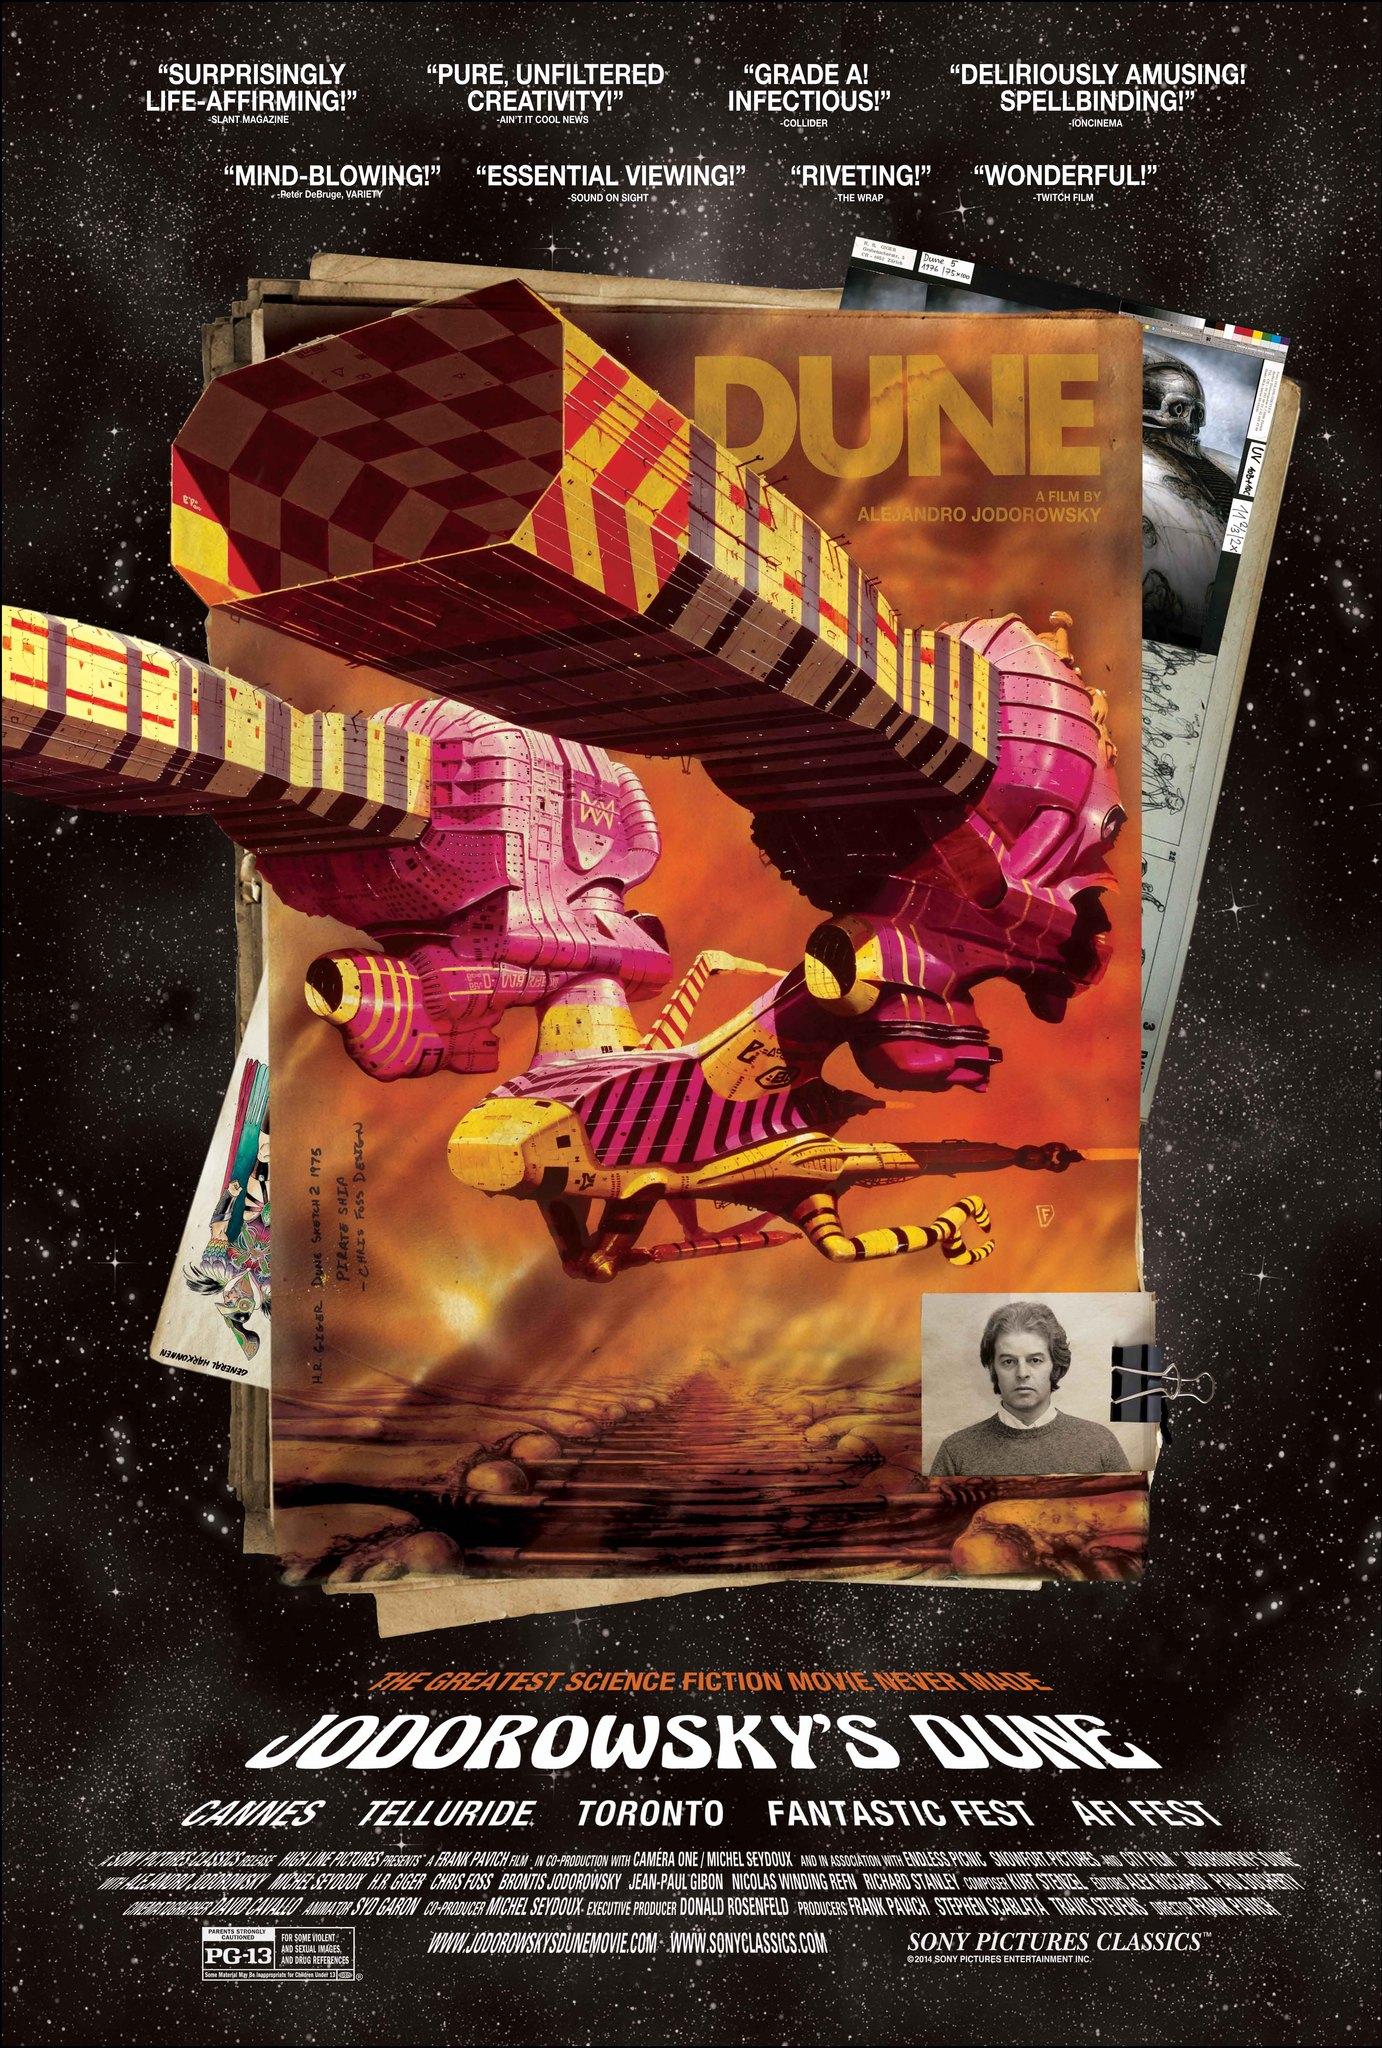 Jodorowsky's Dune kapak